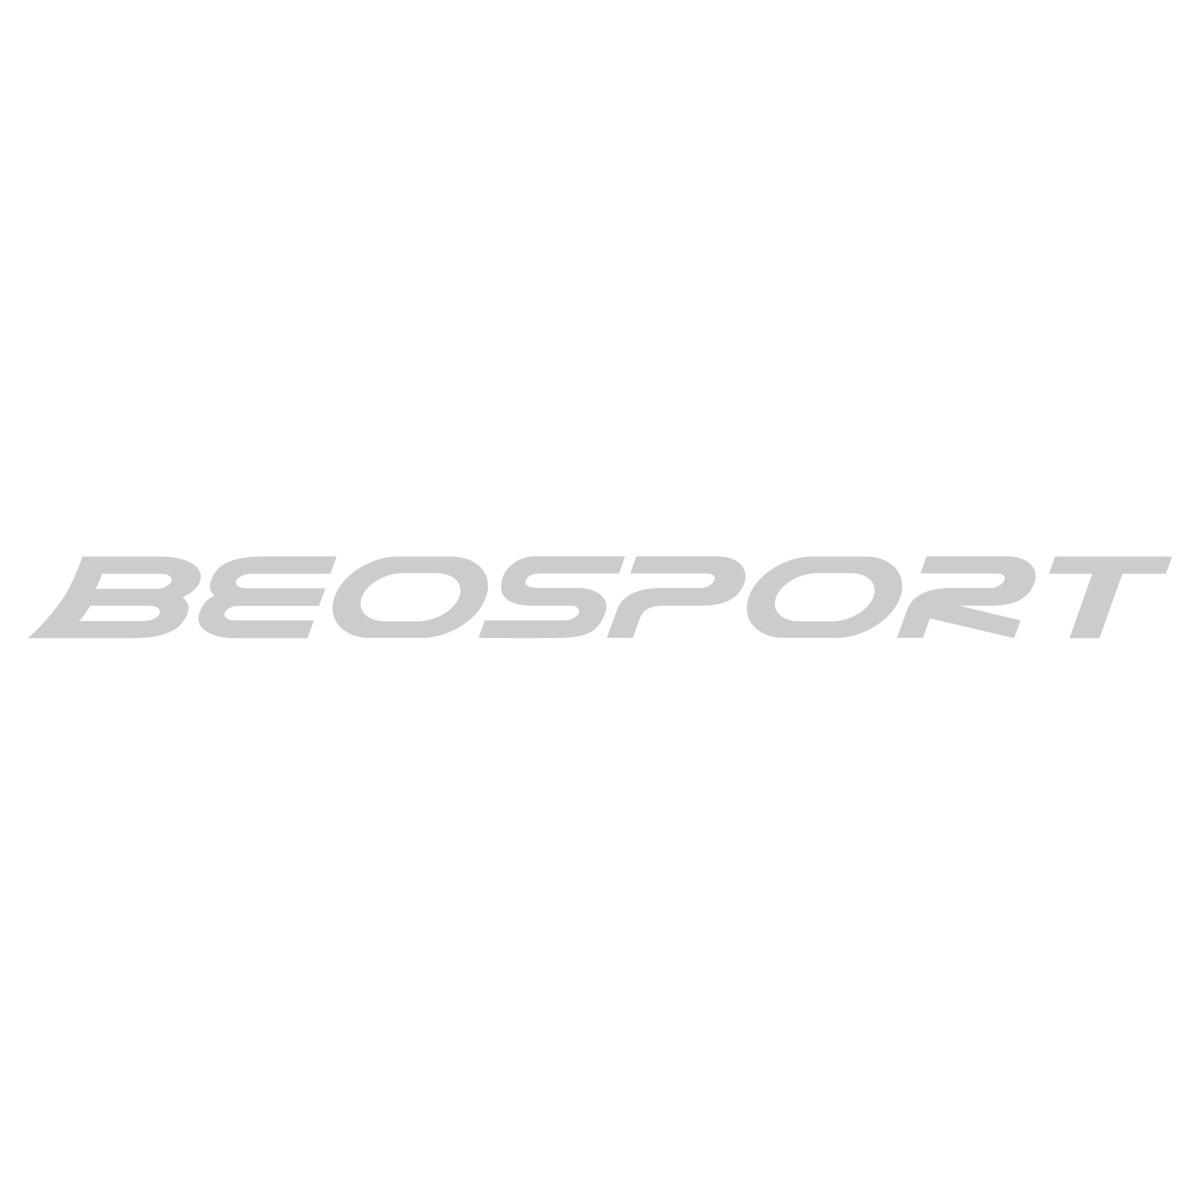 Wilson Revolve White 17 1.25mm / 200m žica za tenis